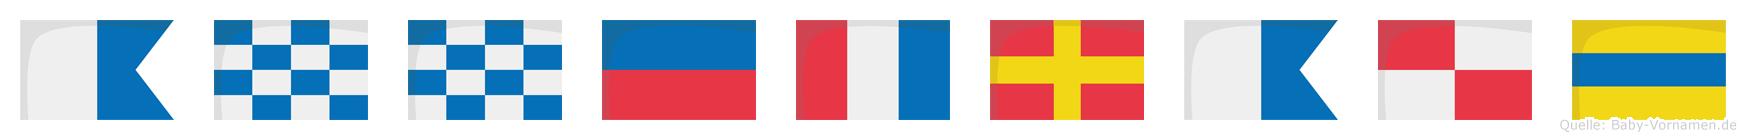 Annetraud im Flaggenalphabet